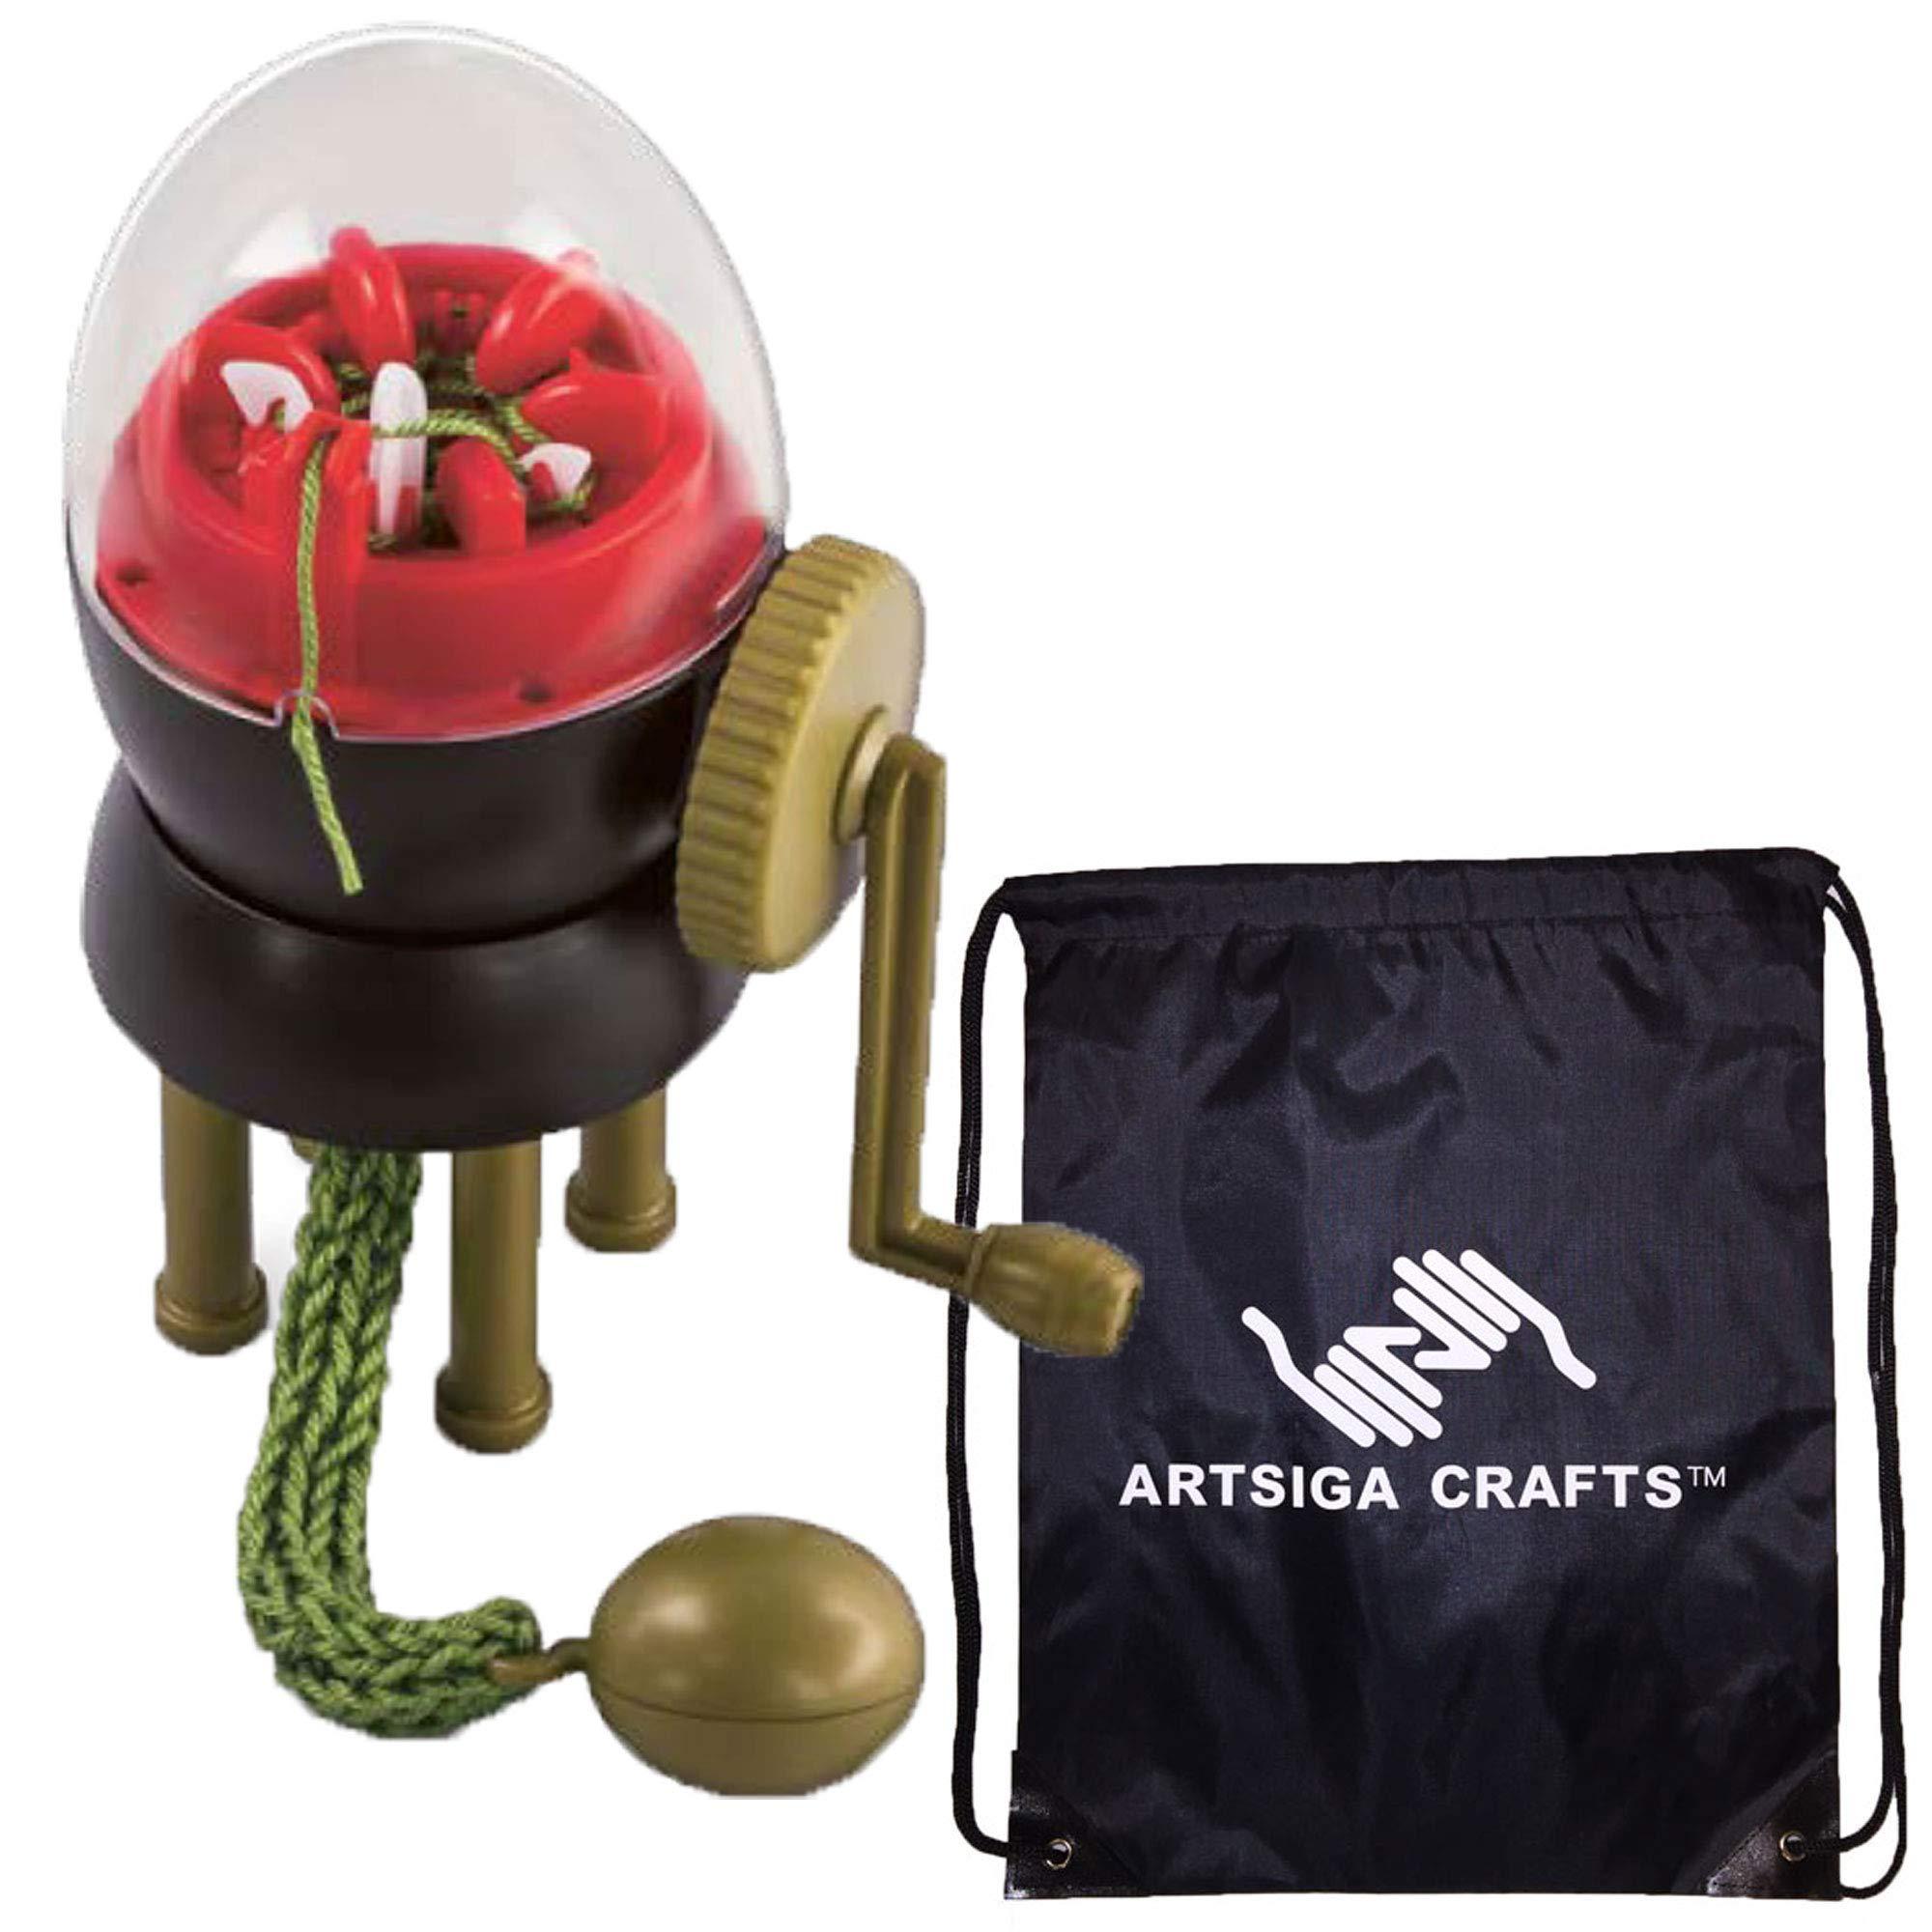 addi Knitting Needles Egg Ei Knitting Machine Bundle with 1 Artsiga Crafts Project Bag